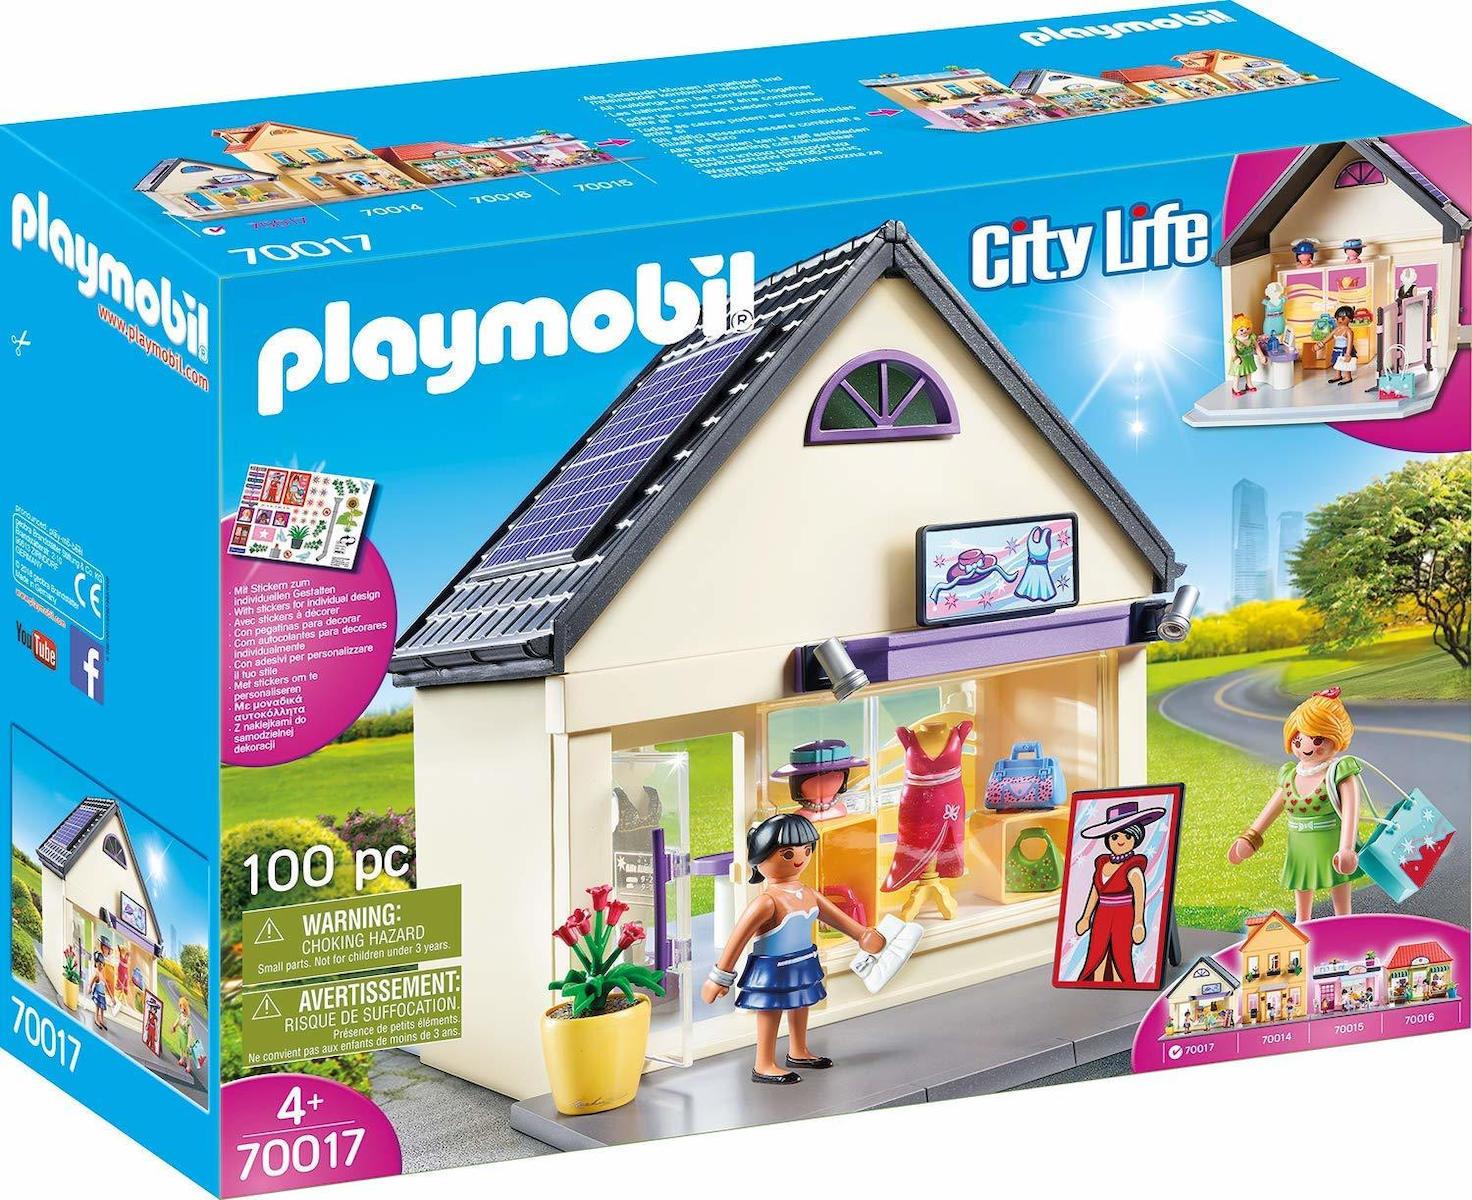 ce4942111894 Προσθήκη στα αγαπημένα menu Playmobil City Life  My Trendboutique